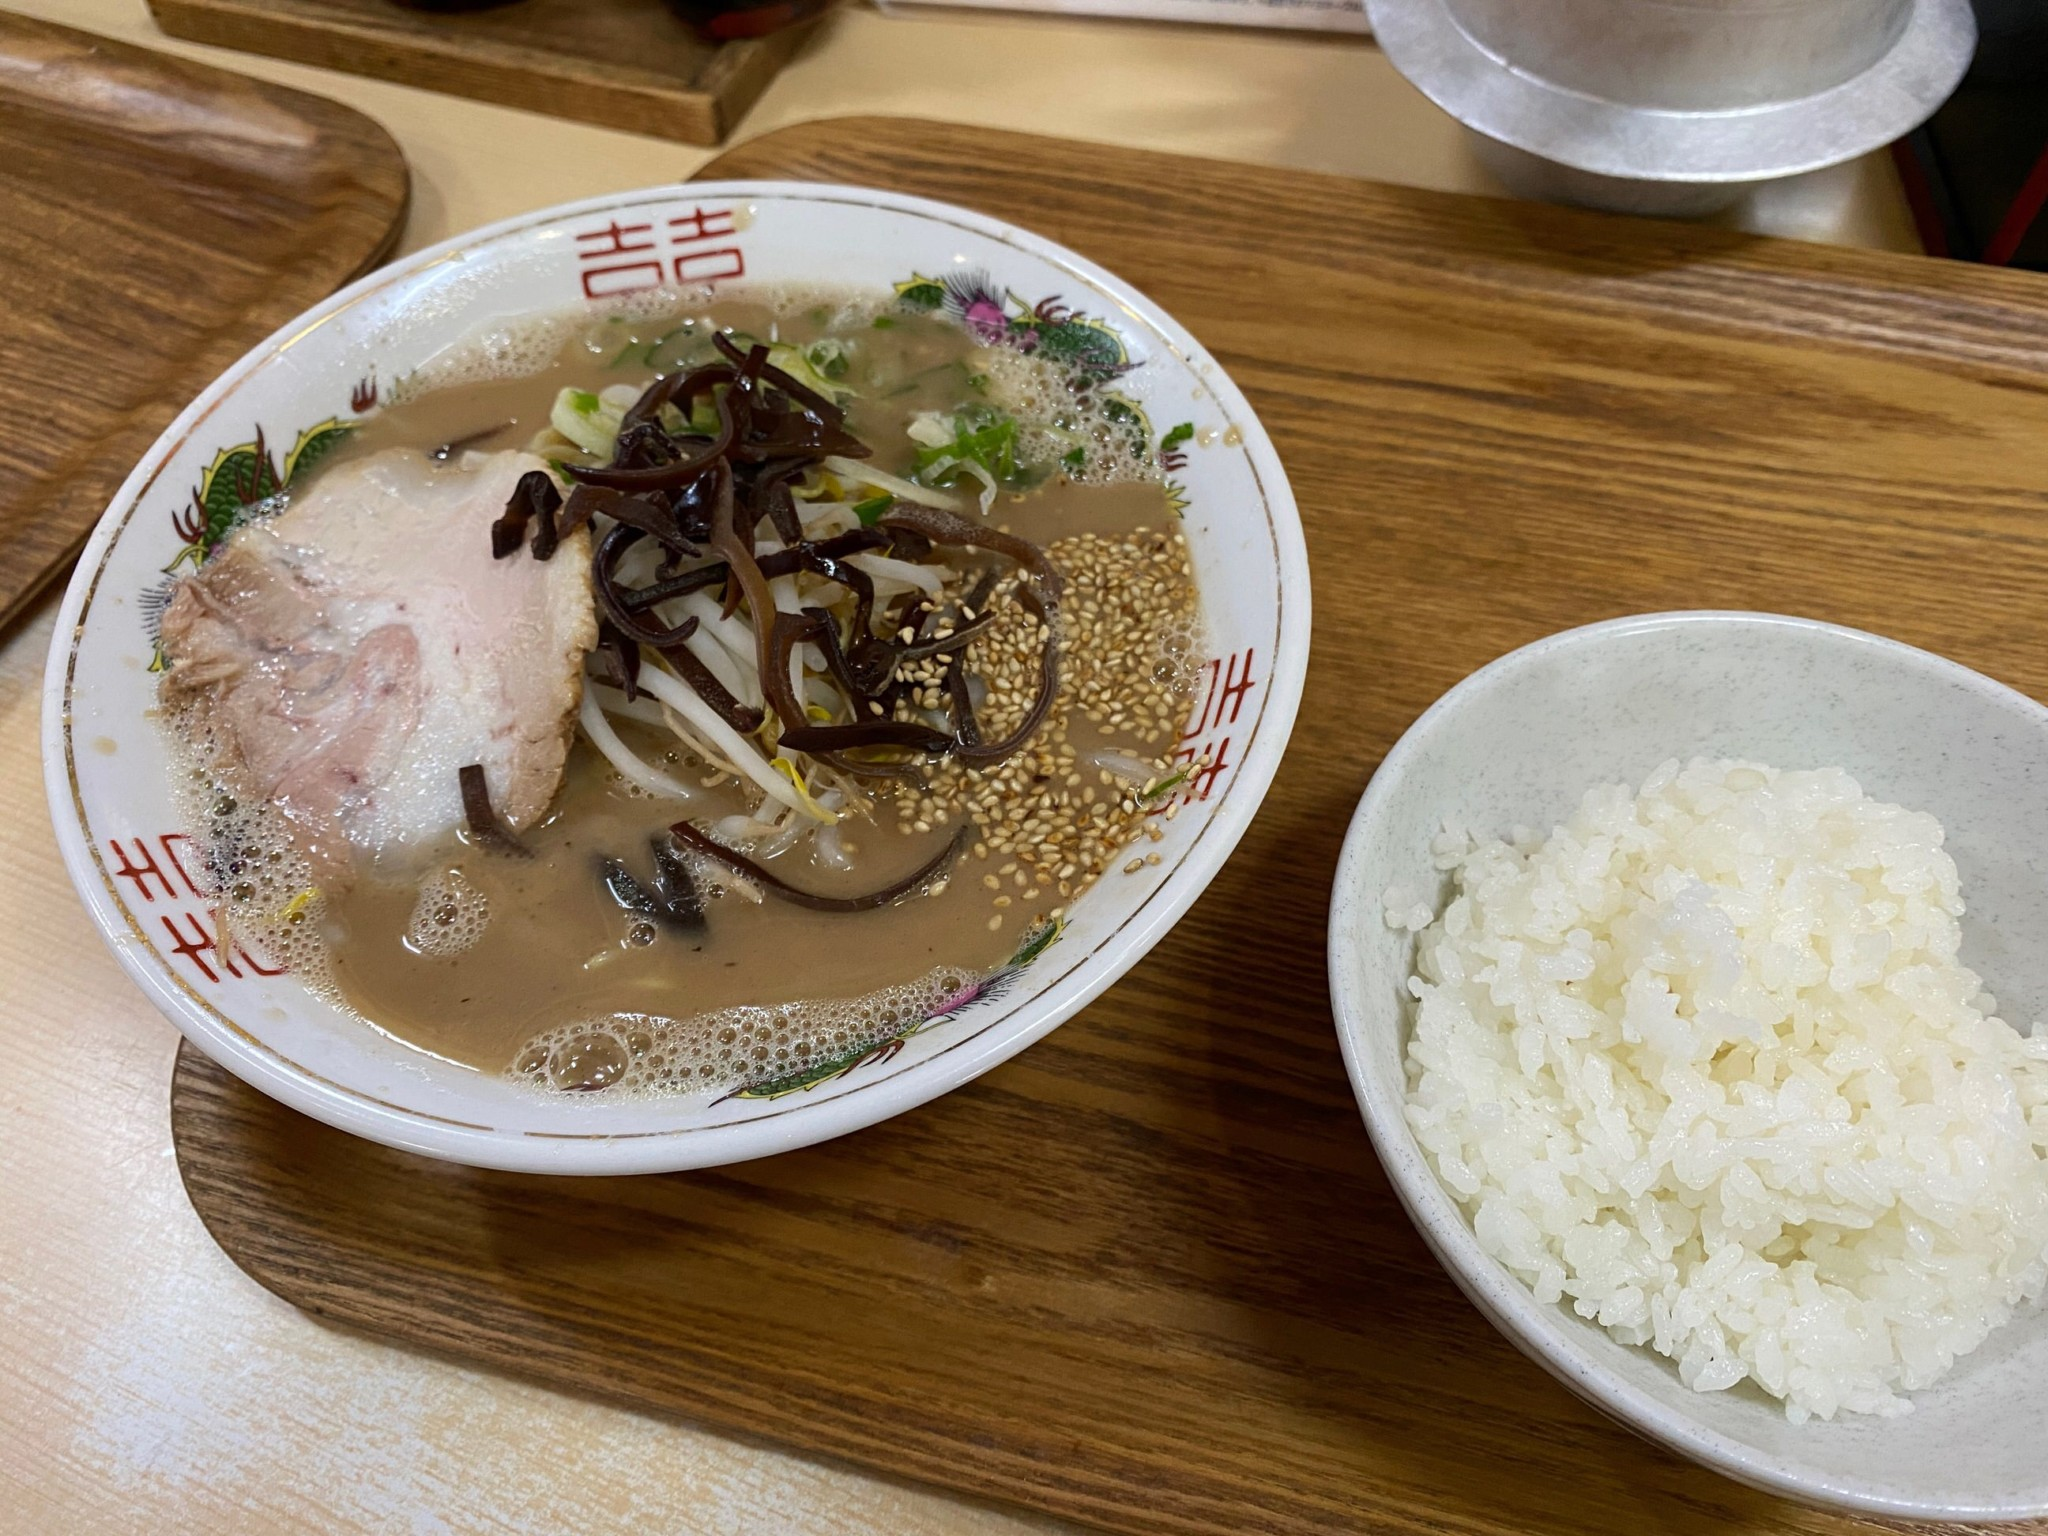 yasokichi ramen